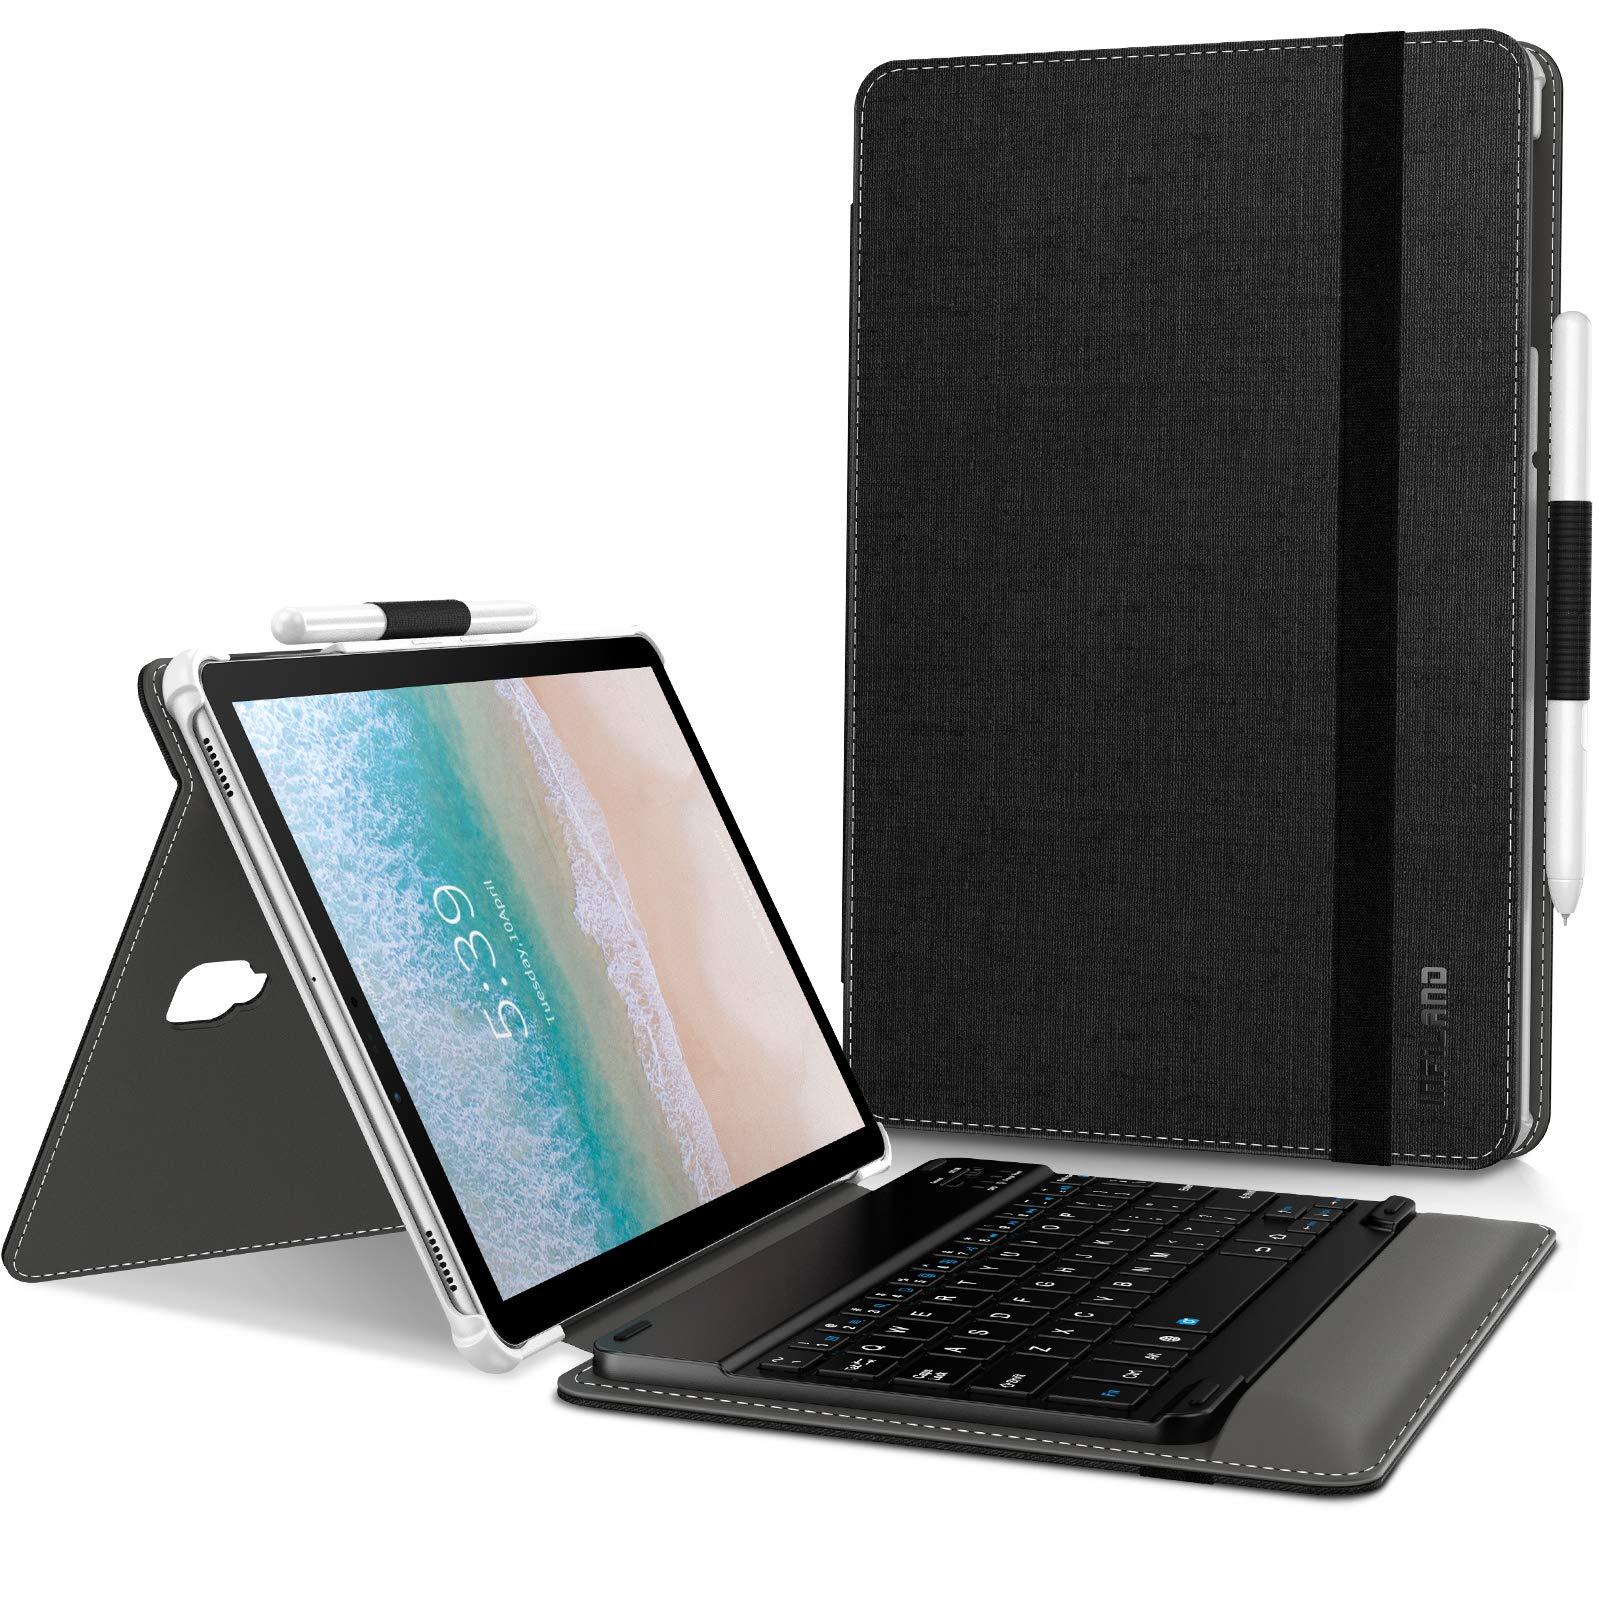 Funda + Teclado Galaxy Tab S4 10.5 Infiland [7j4grrlz]